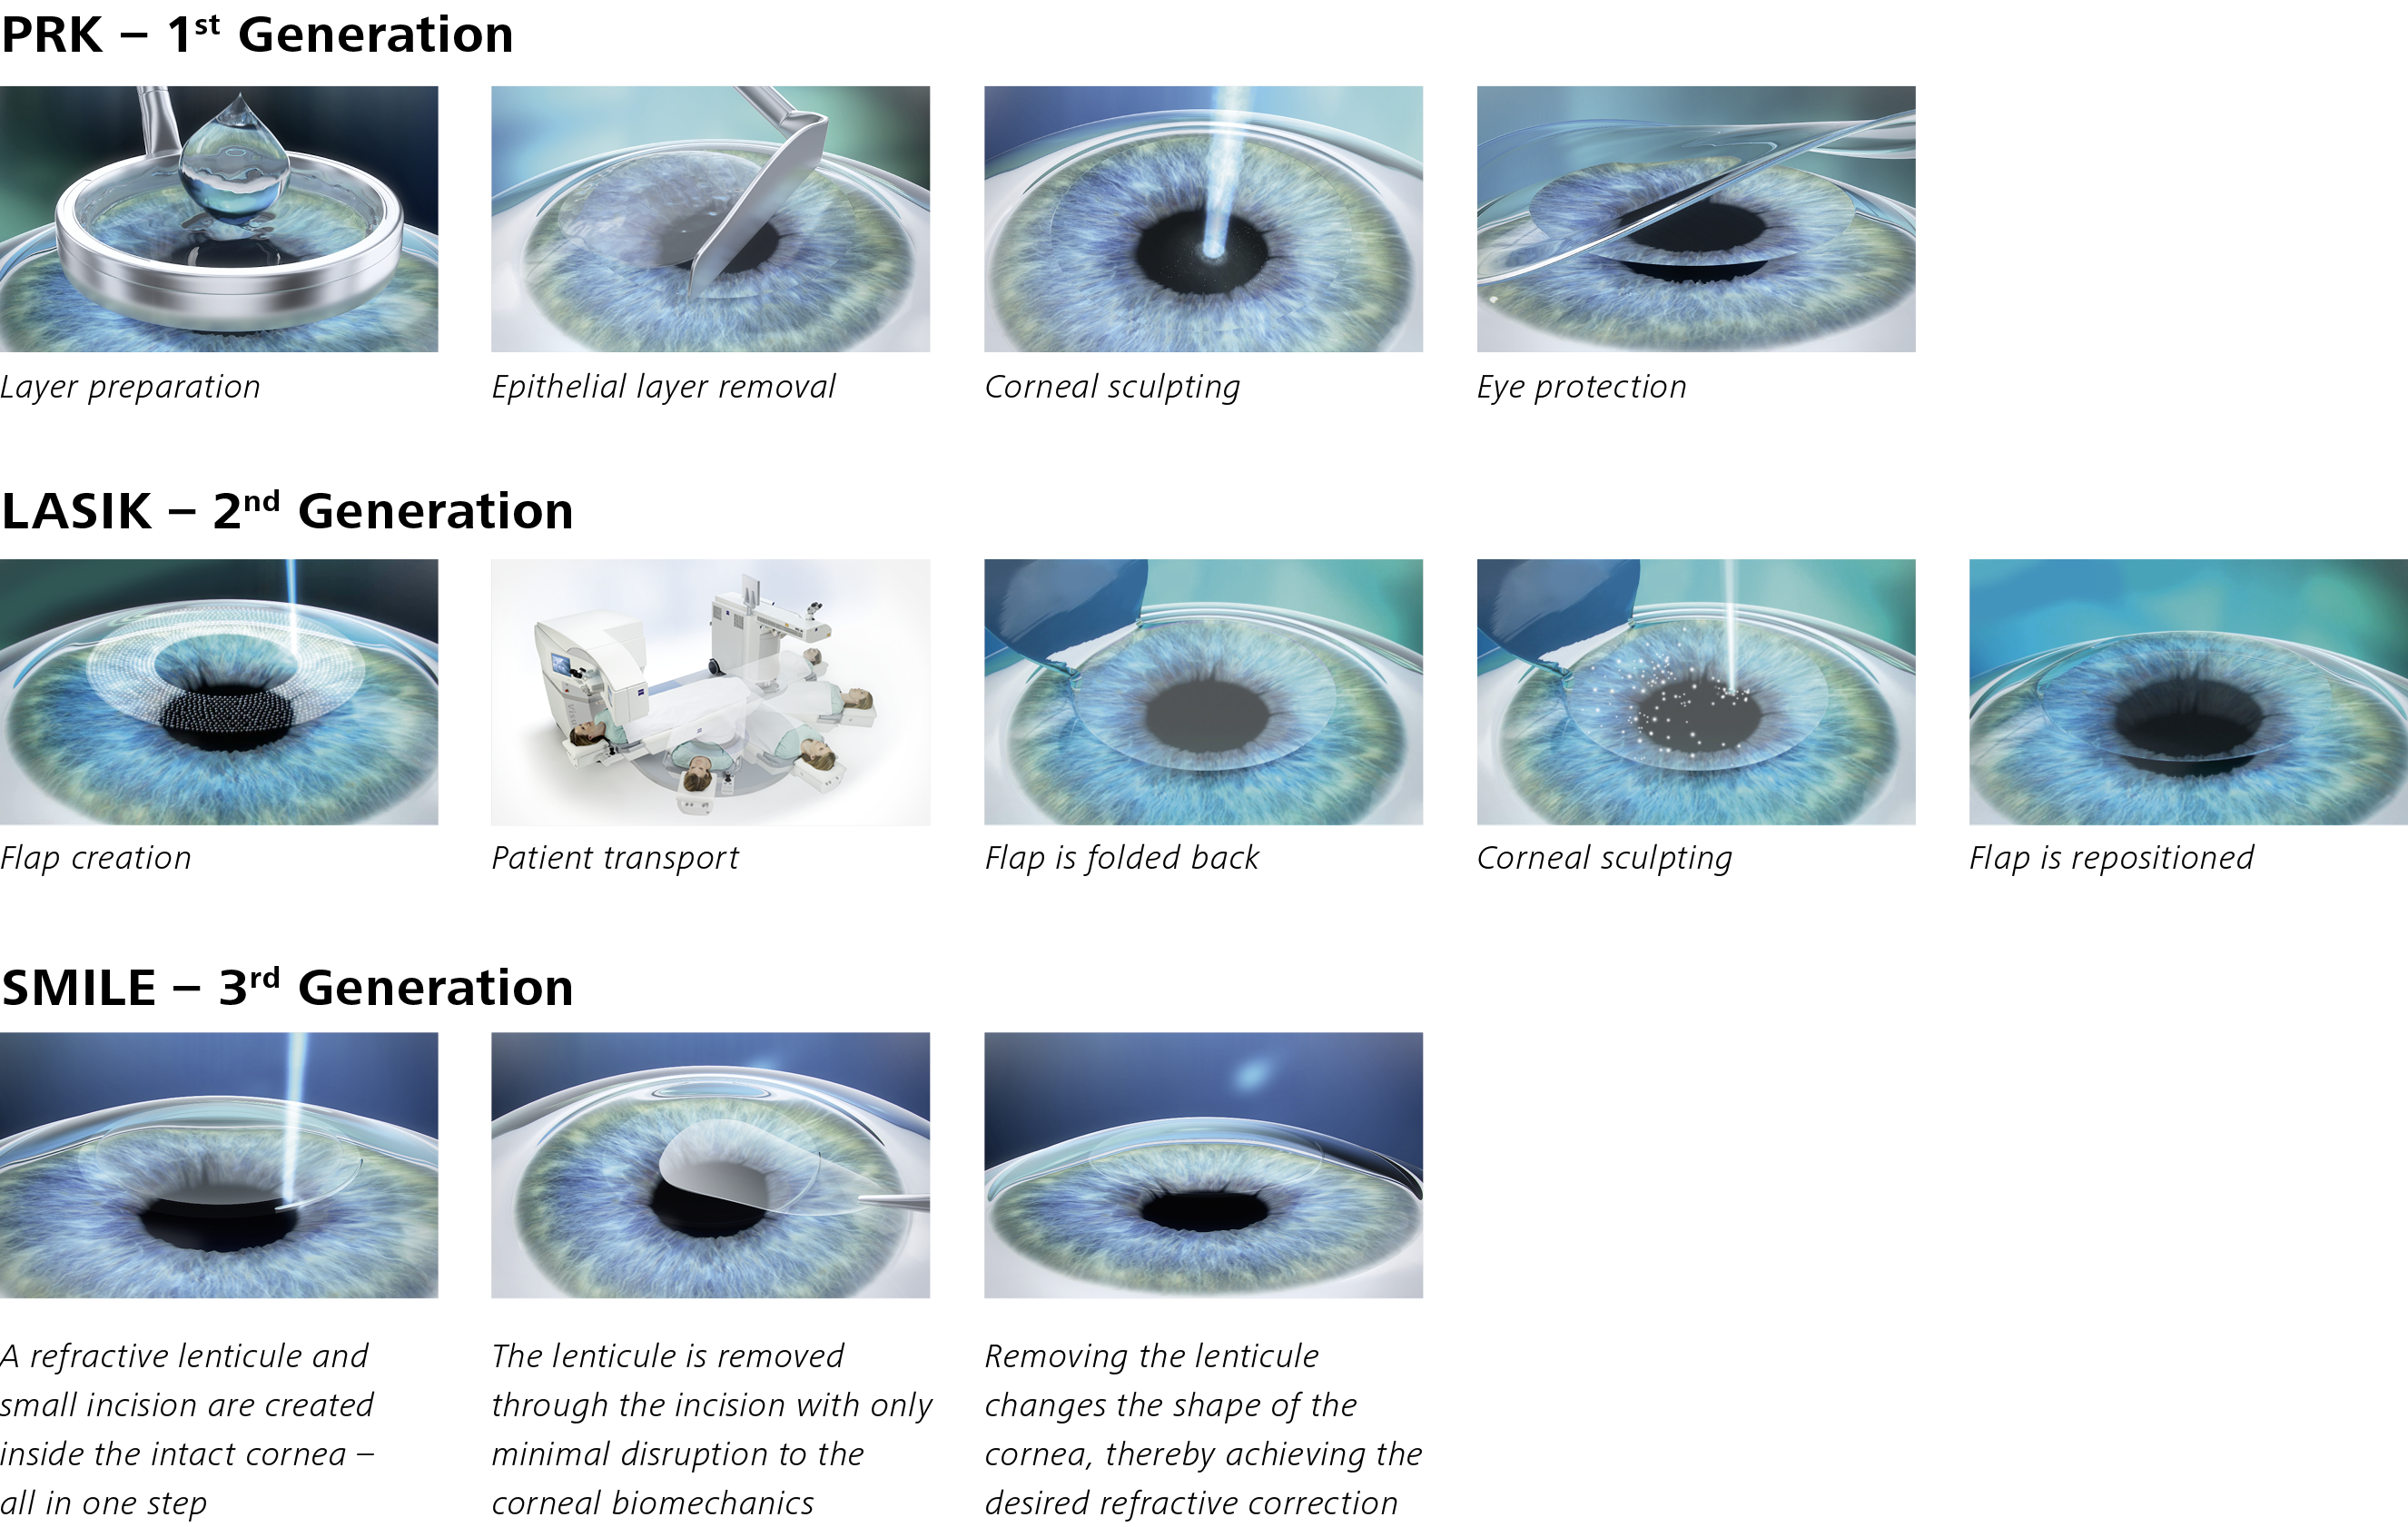 Prk Lasik Smile 3generations Px Education Insight Eye